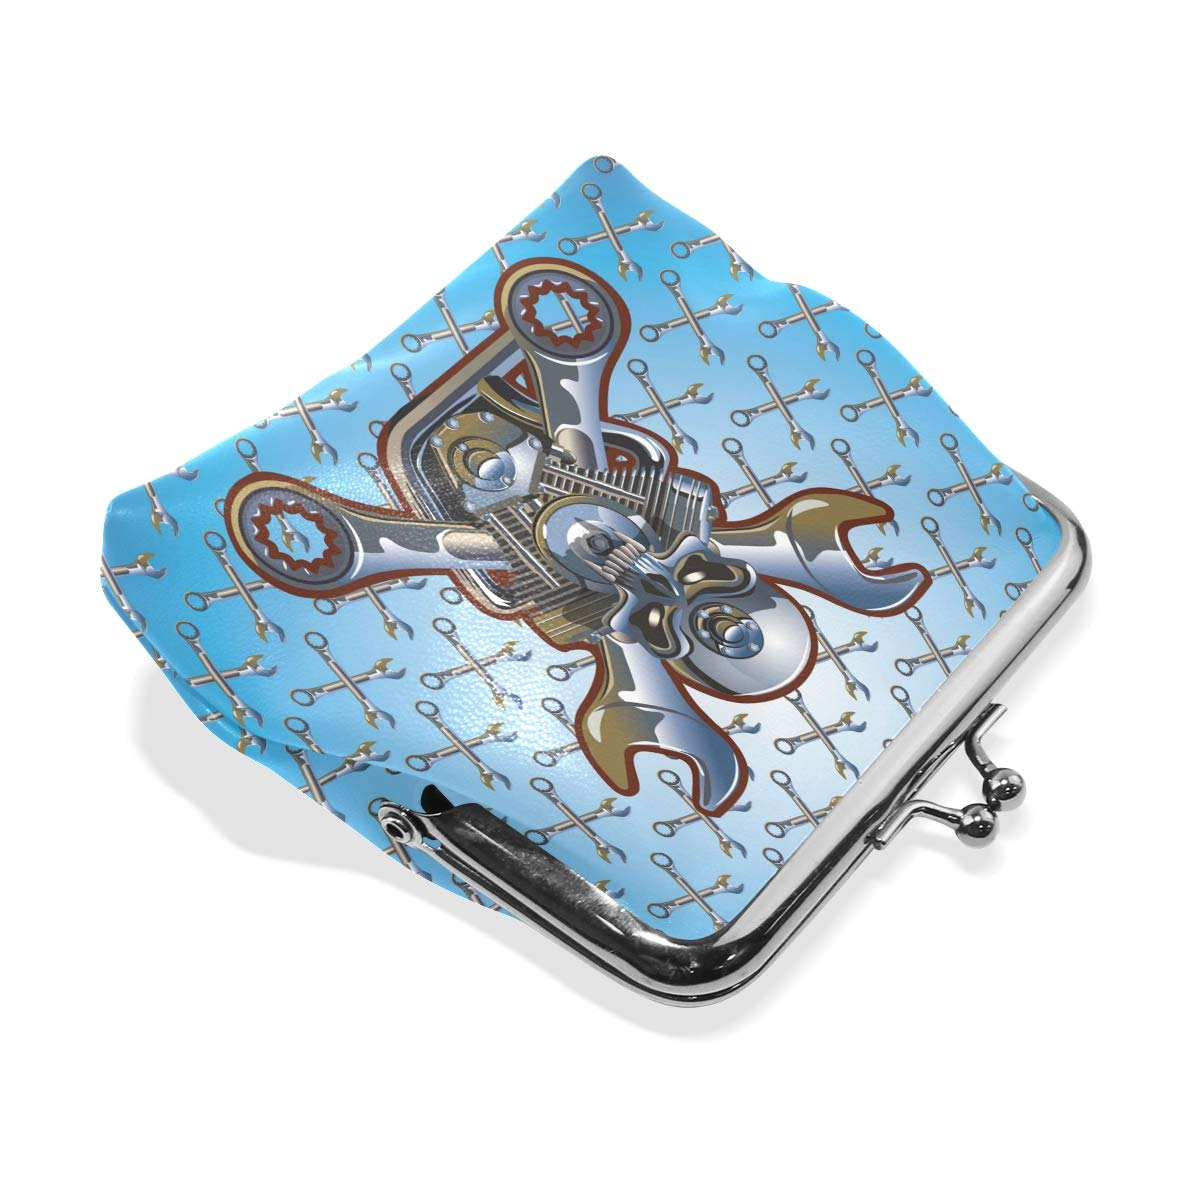 LALATOP Motorcycle Skull Womens Coin Pouch Purse wallet Card Holder Clutch Handbag